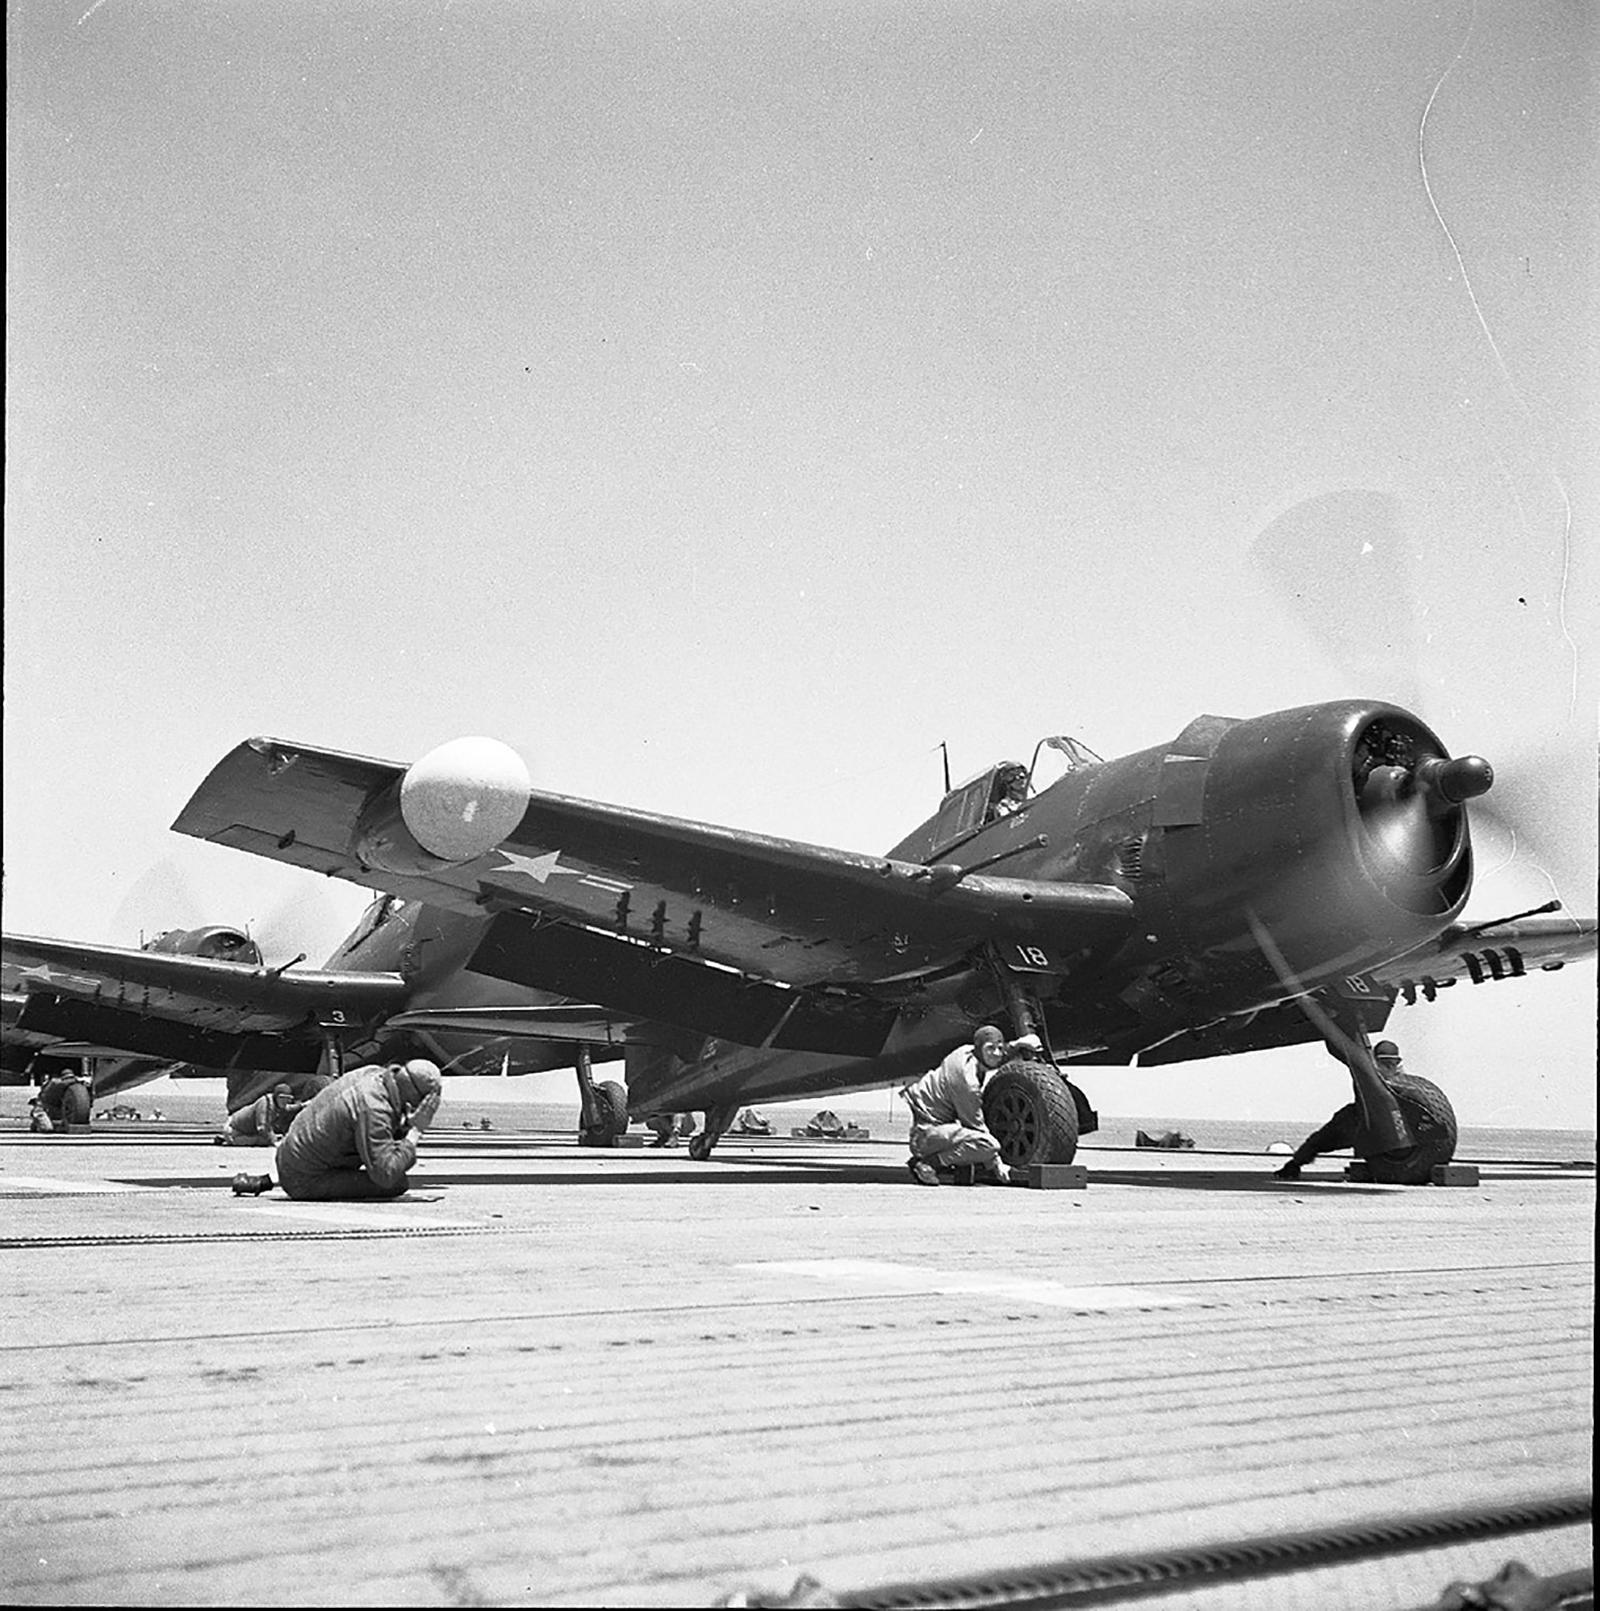 Grumman F6F 5N Hellcat White 18 being prepared for take off 01